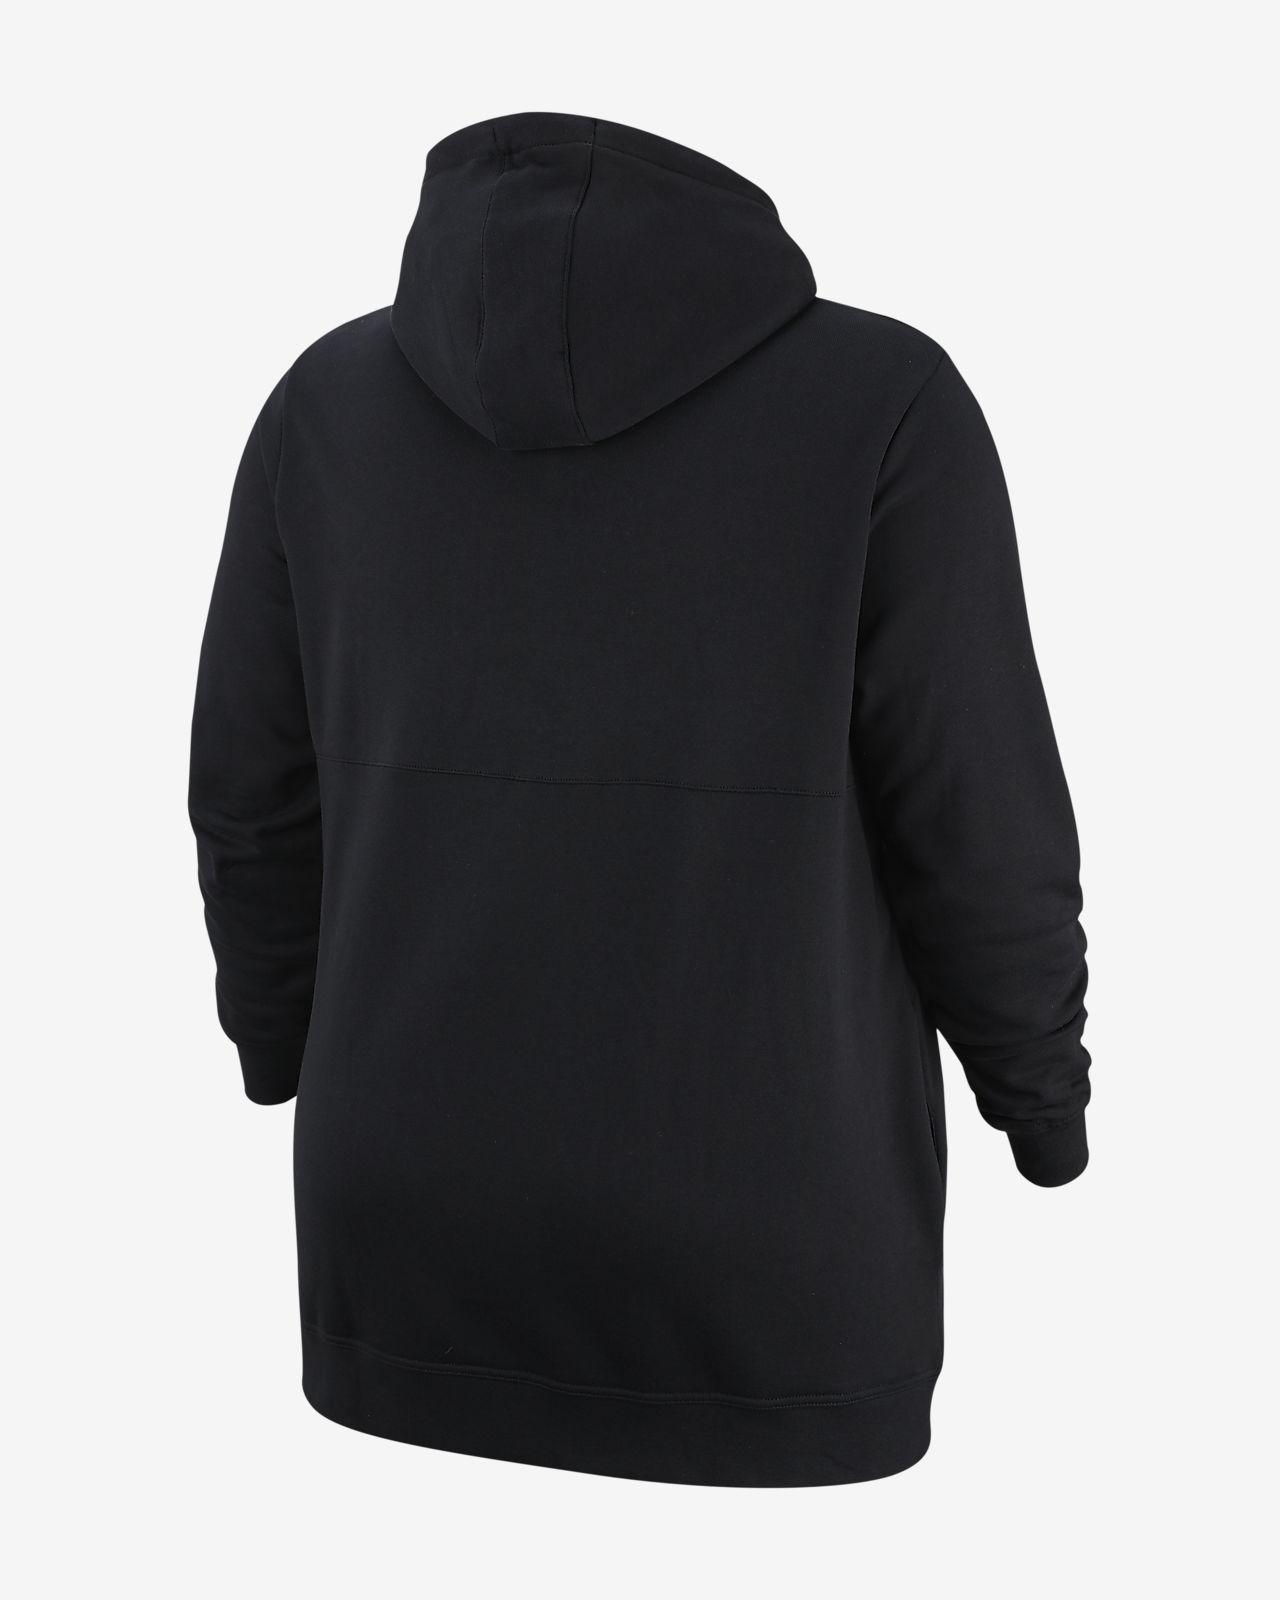 Nike Sportswear Swoosh Women s French Terry Dress (Plus Size). Nike ... 031631a52